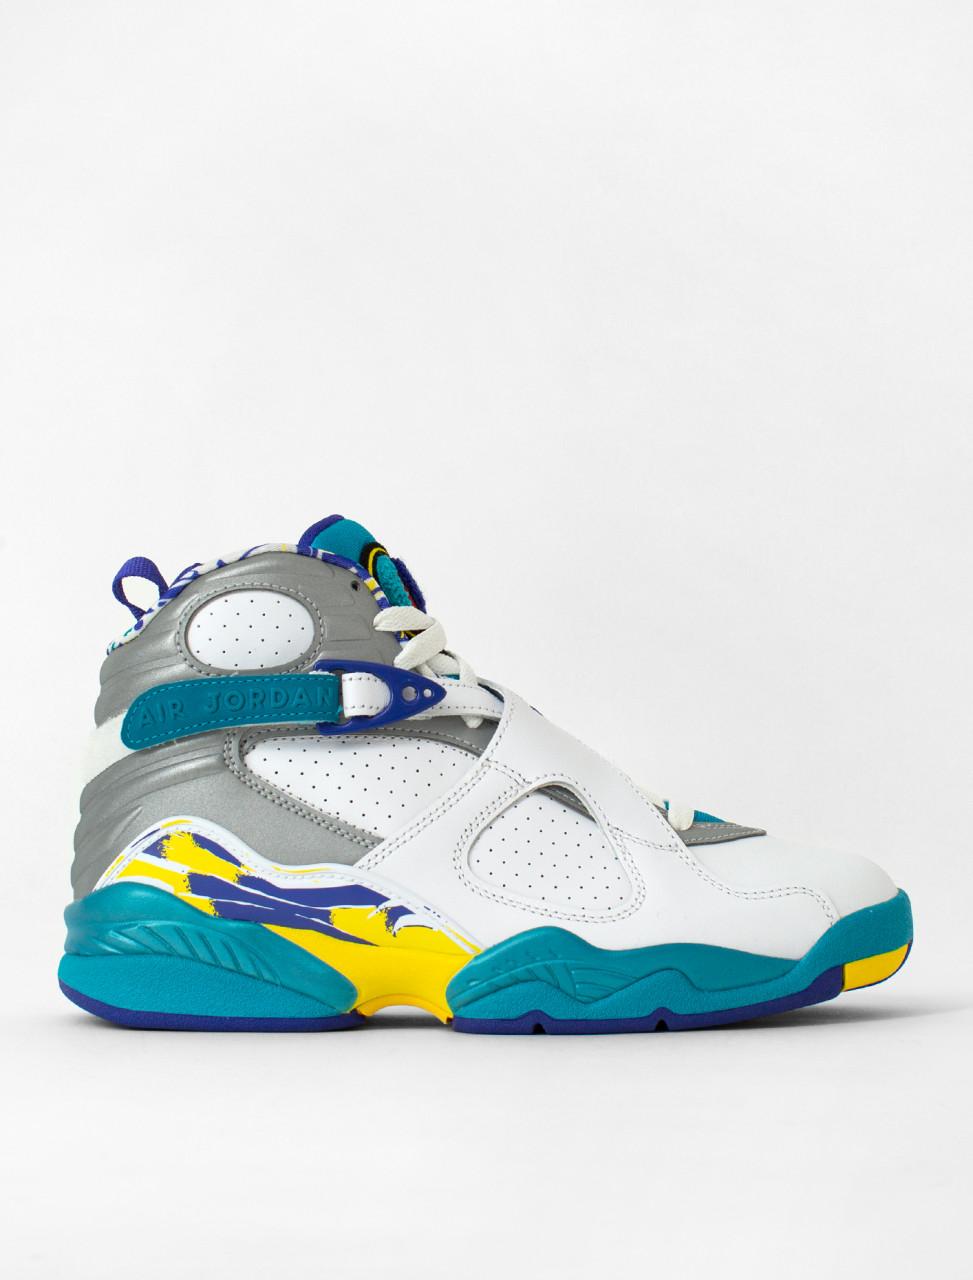 Air Jordan 8 Retro Sneaker